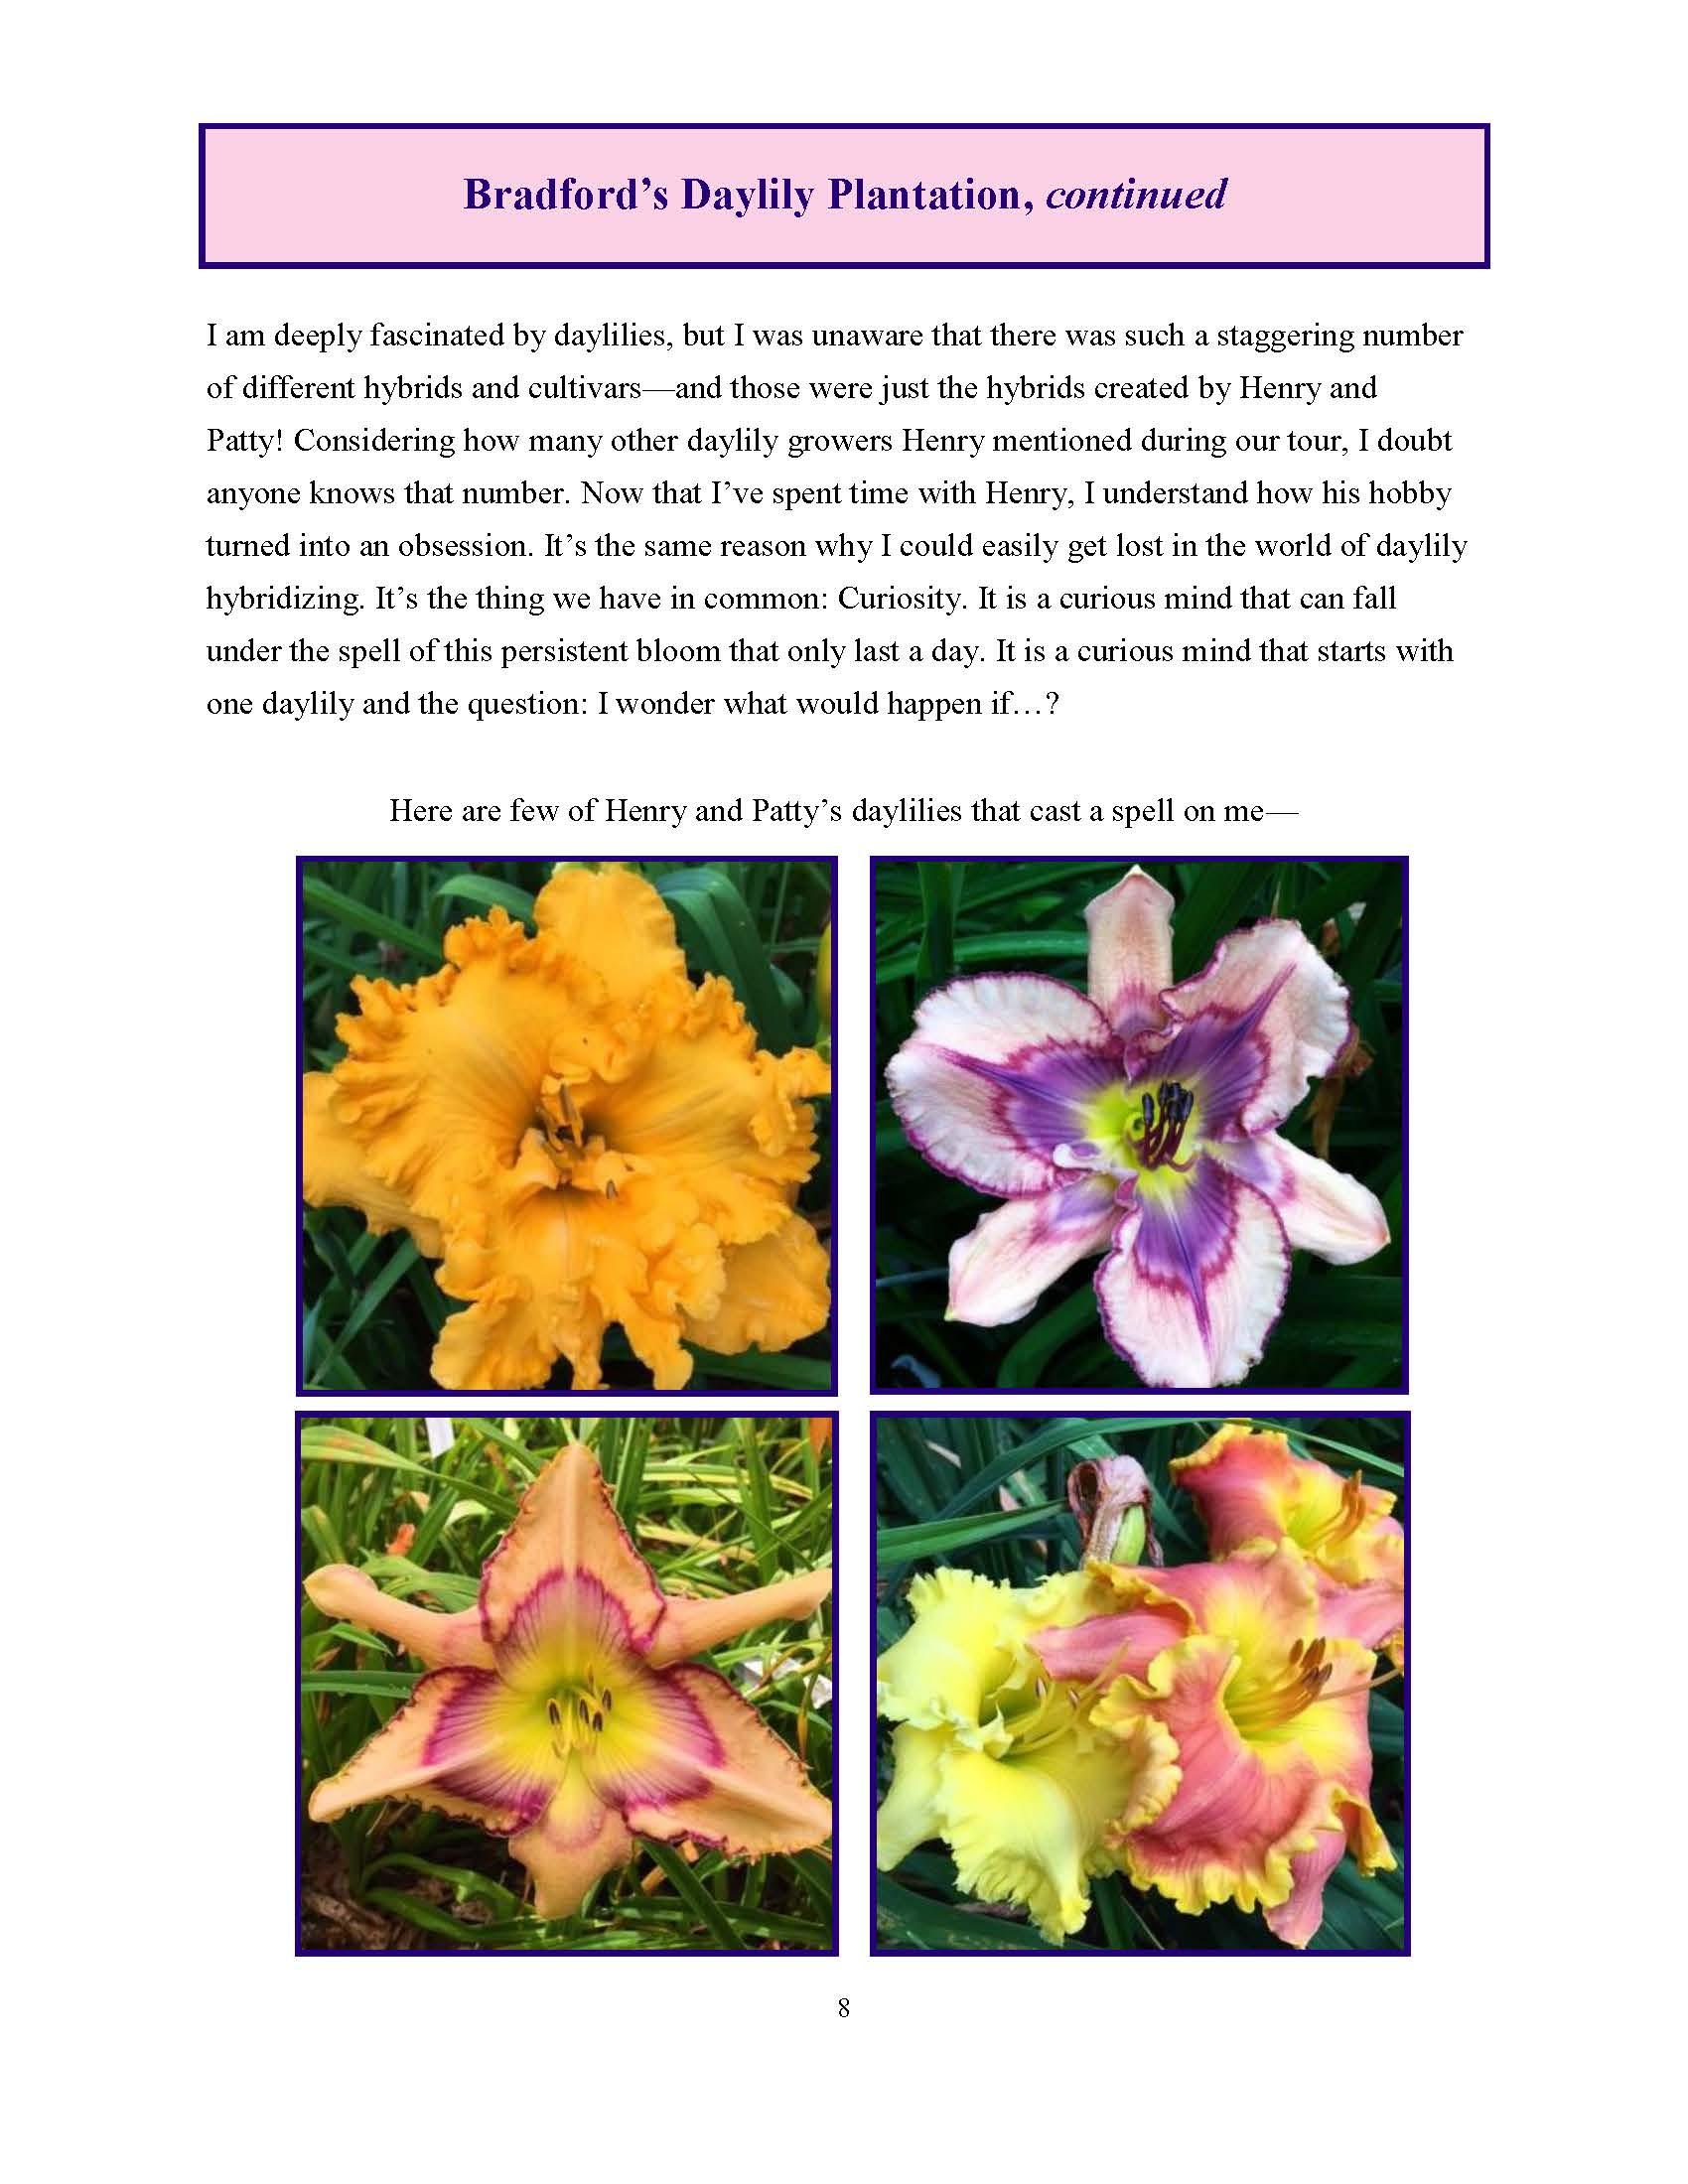 June 2017 Gardengoer_Page_08.jpg